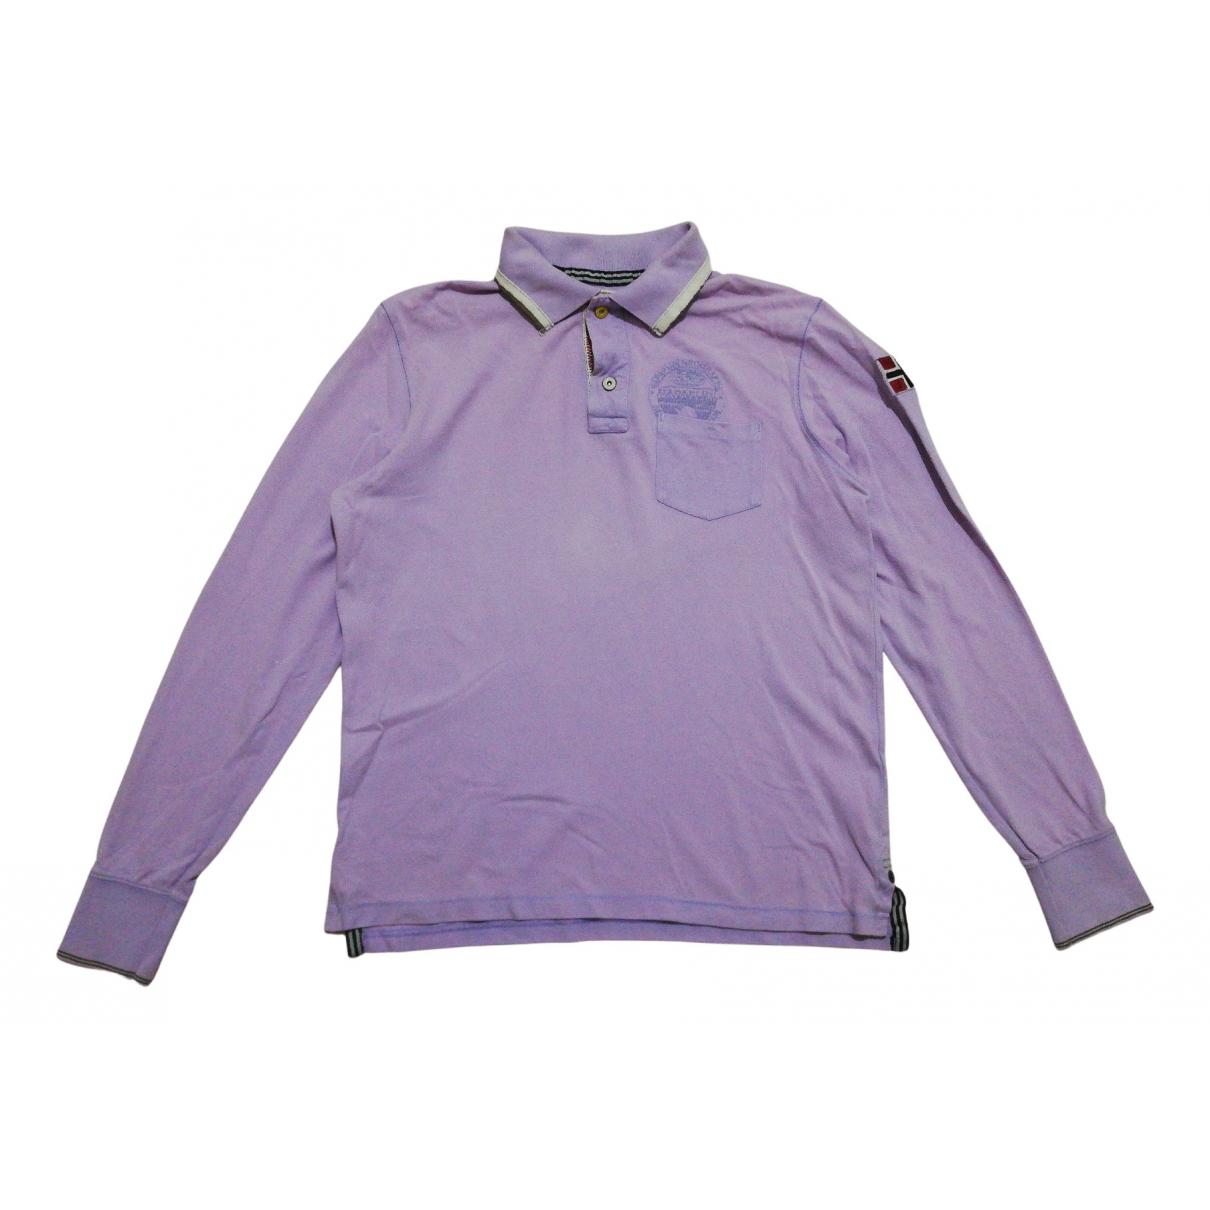 Napapijri \N Poloshirts in  Lila Baumwolle